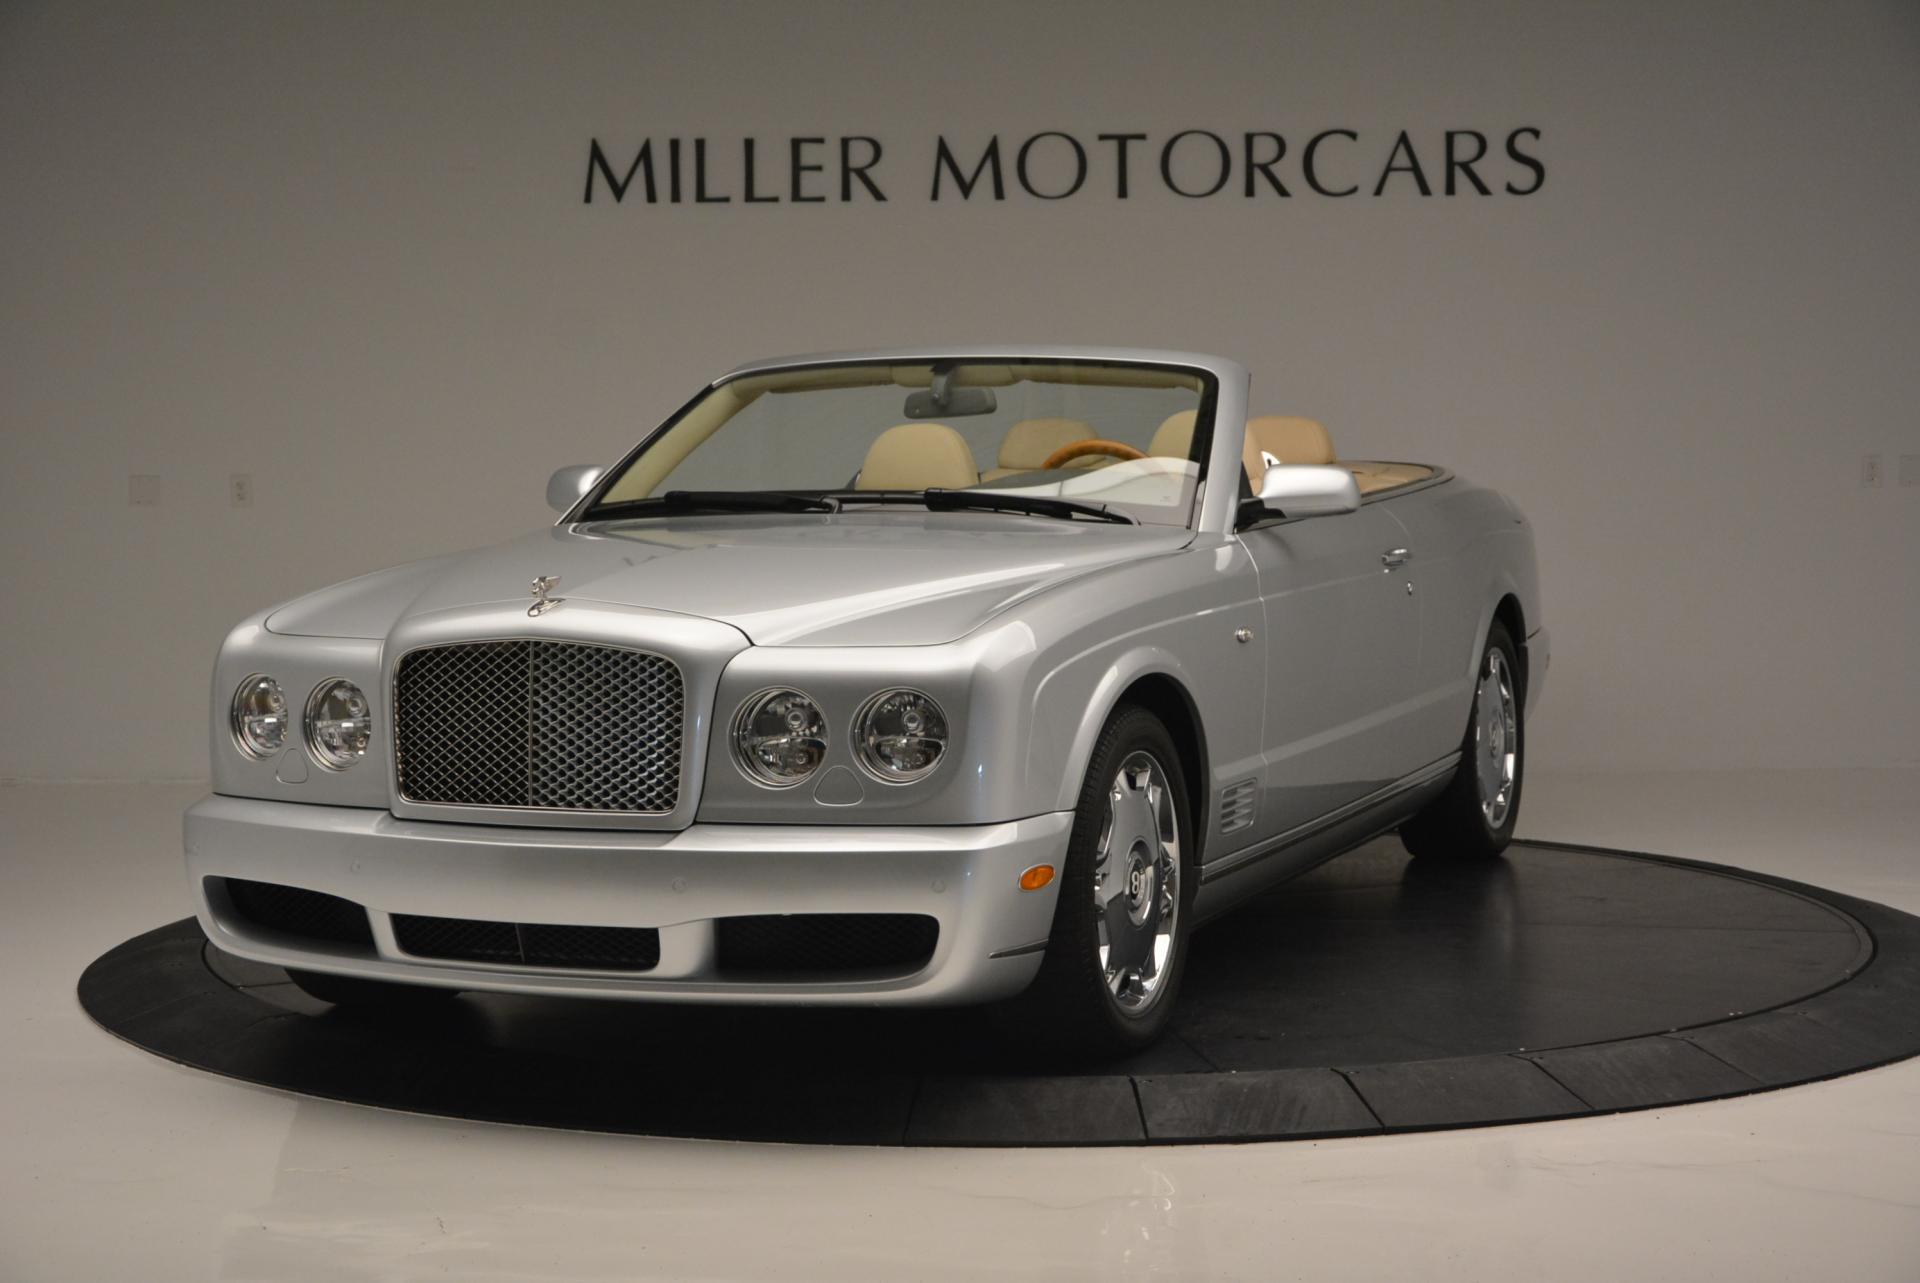 Used 2008 Bentley Azure for sale Sold at Alfa Romeo of Westport in Westport CT 06880 1